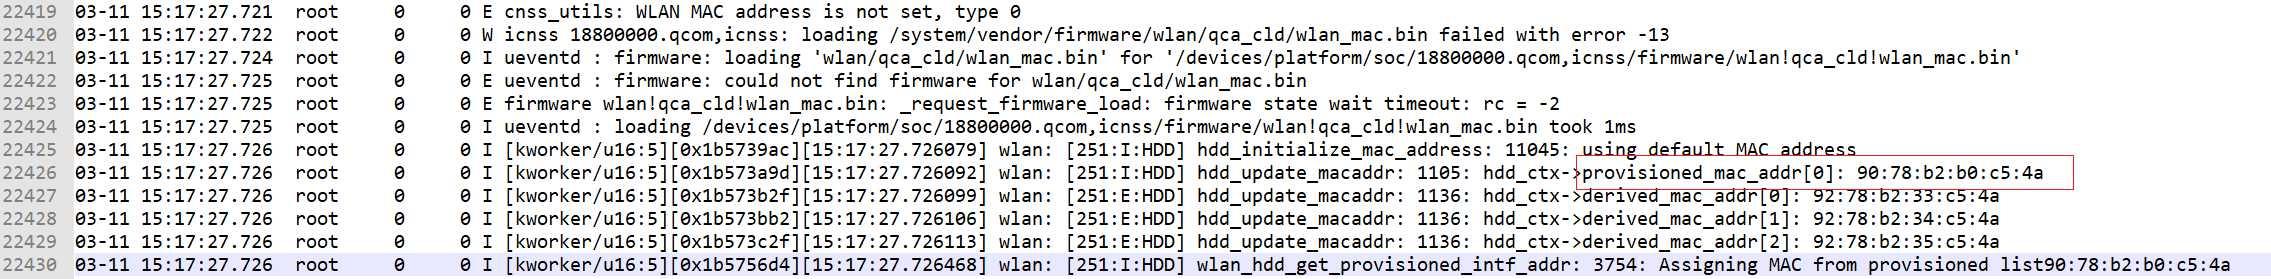 [BUG]新加坡地区wlan mac地址异常